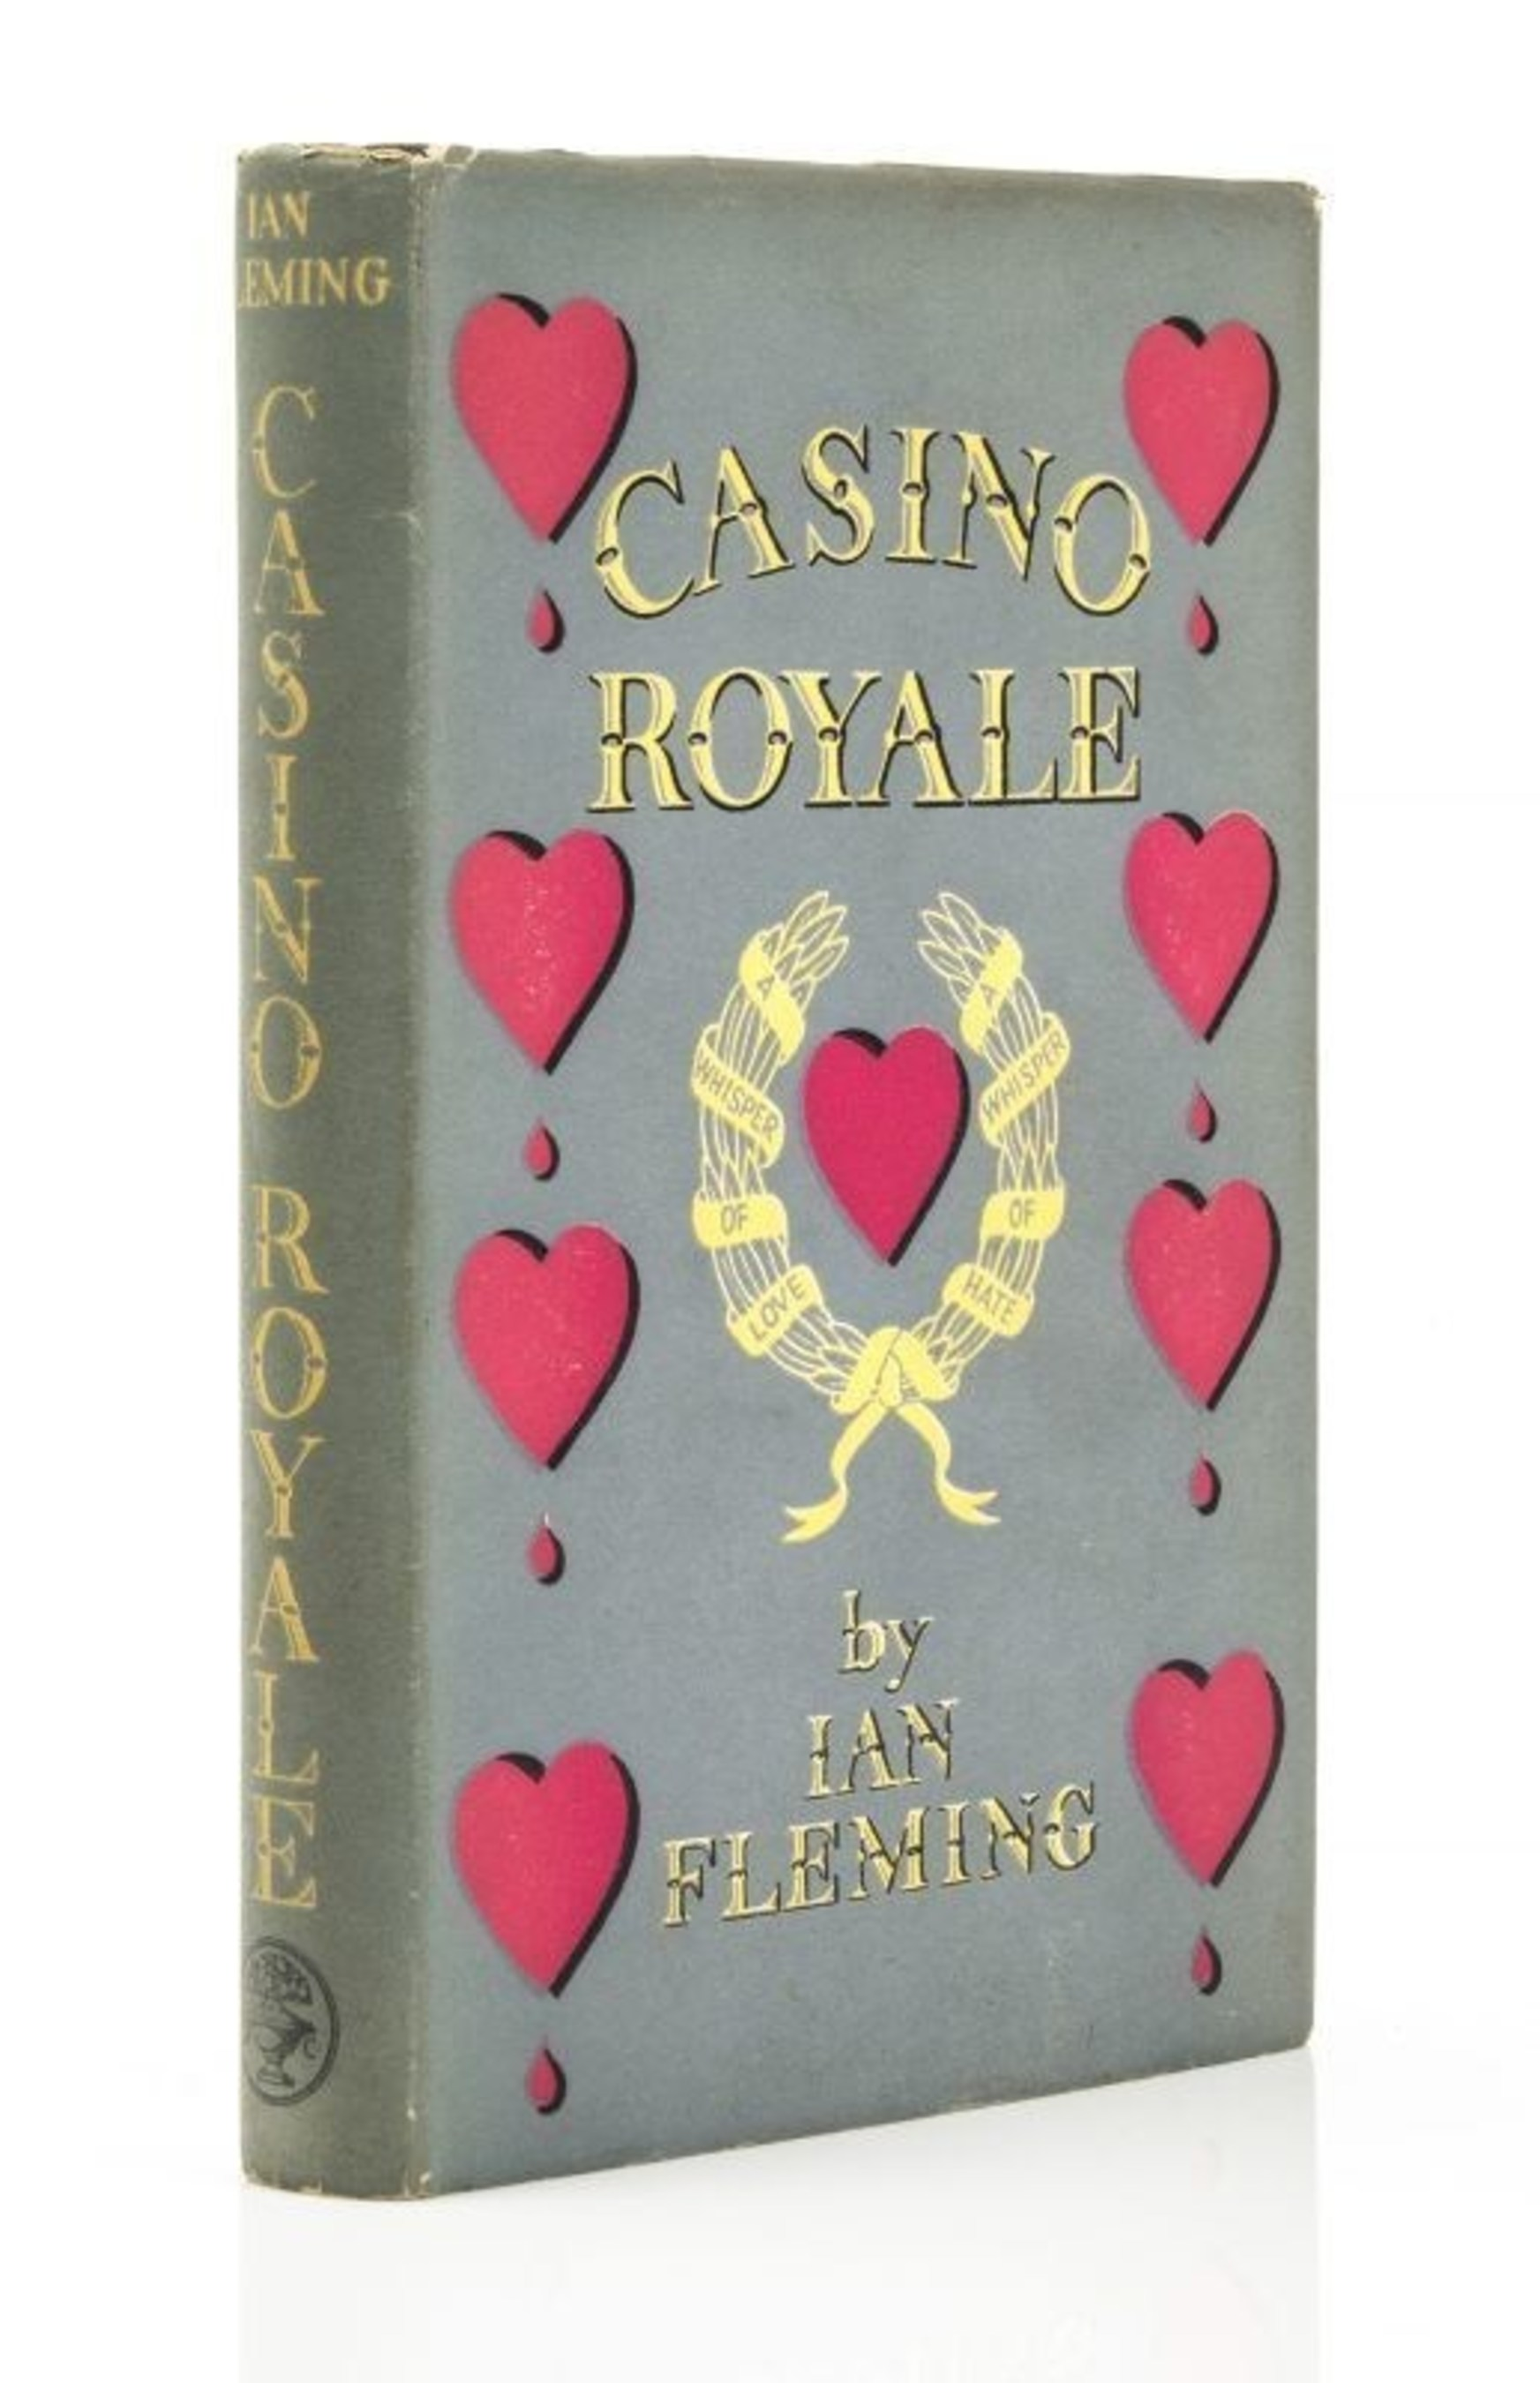 For sale Casion Royale first edition by Ian Fleming (PRNewsFoto/The-saleroom.com) (PRNewsFoto/The-saleroom.com)